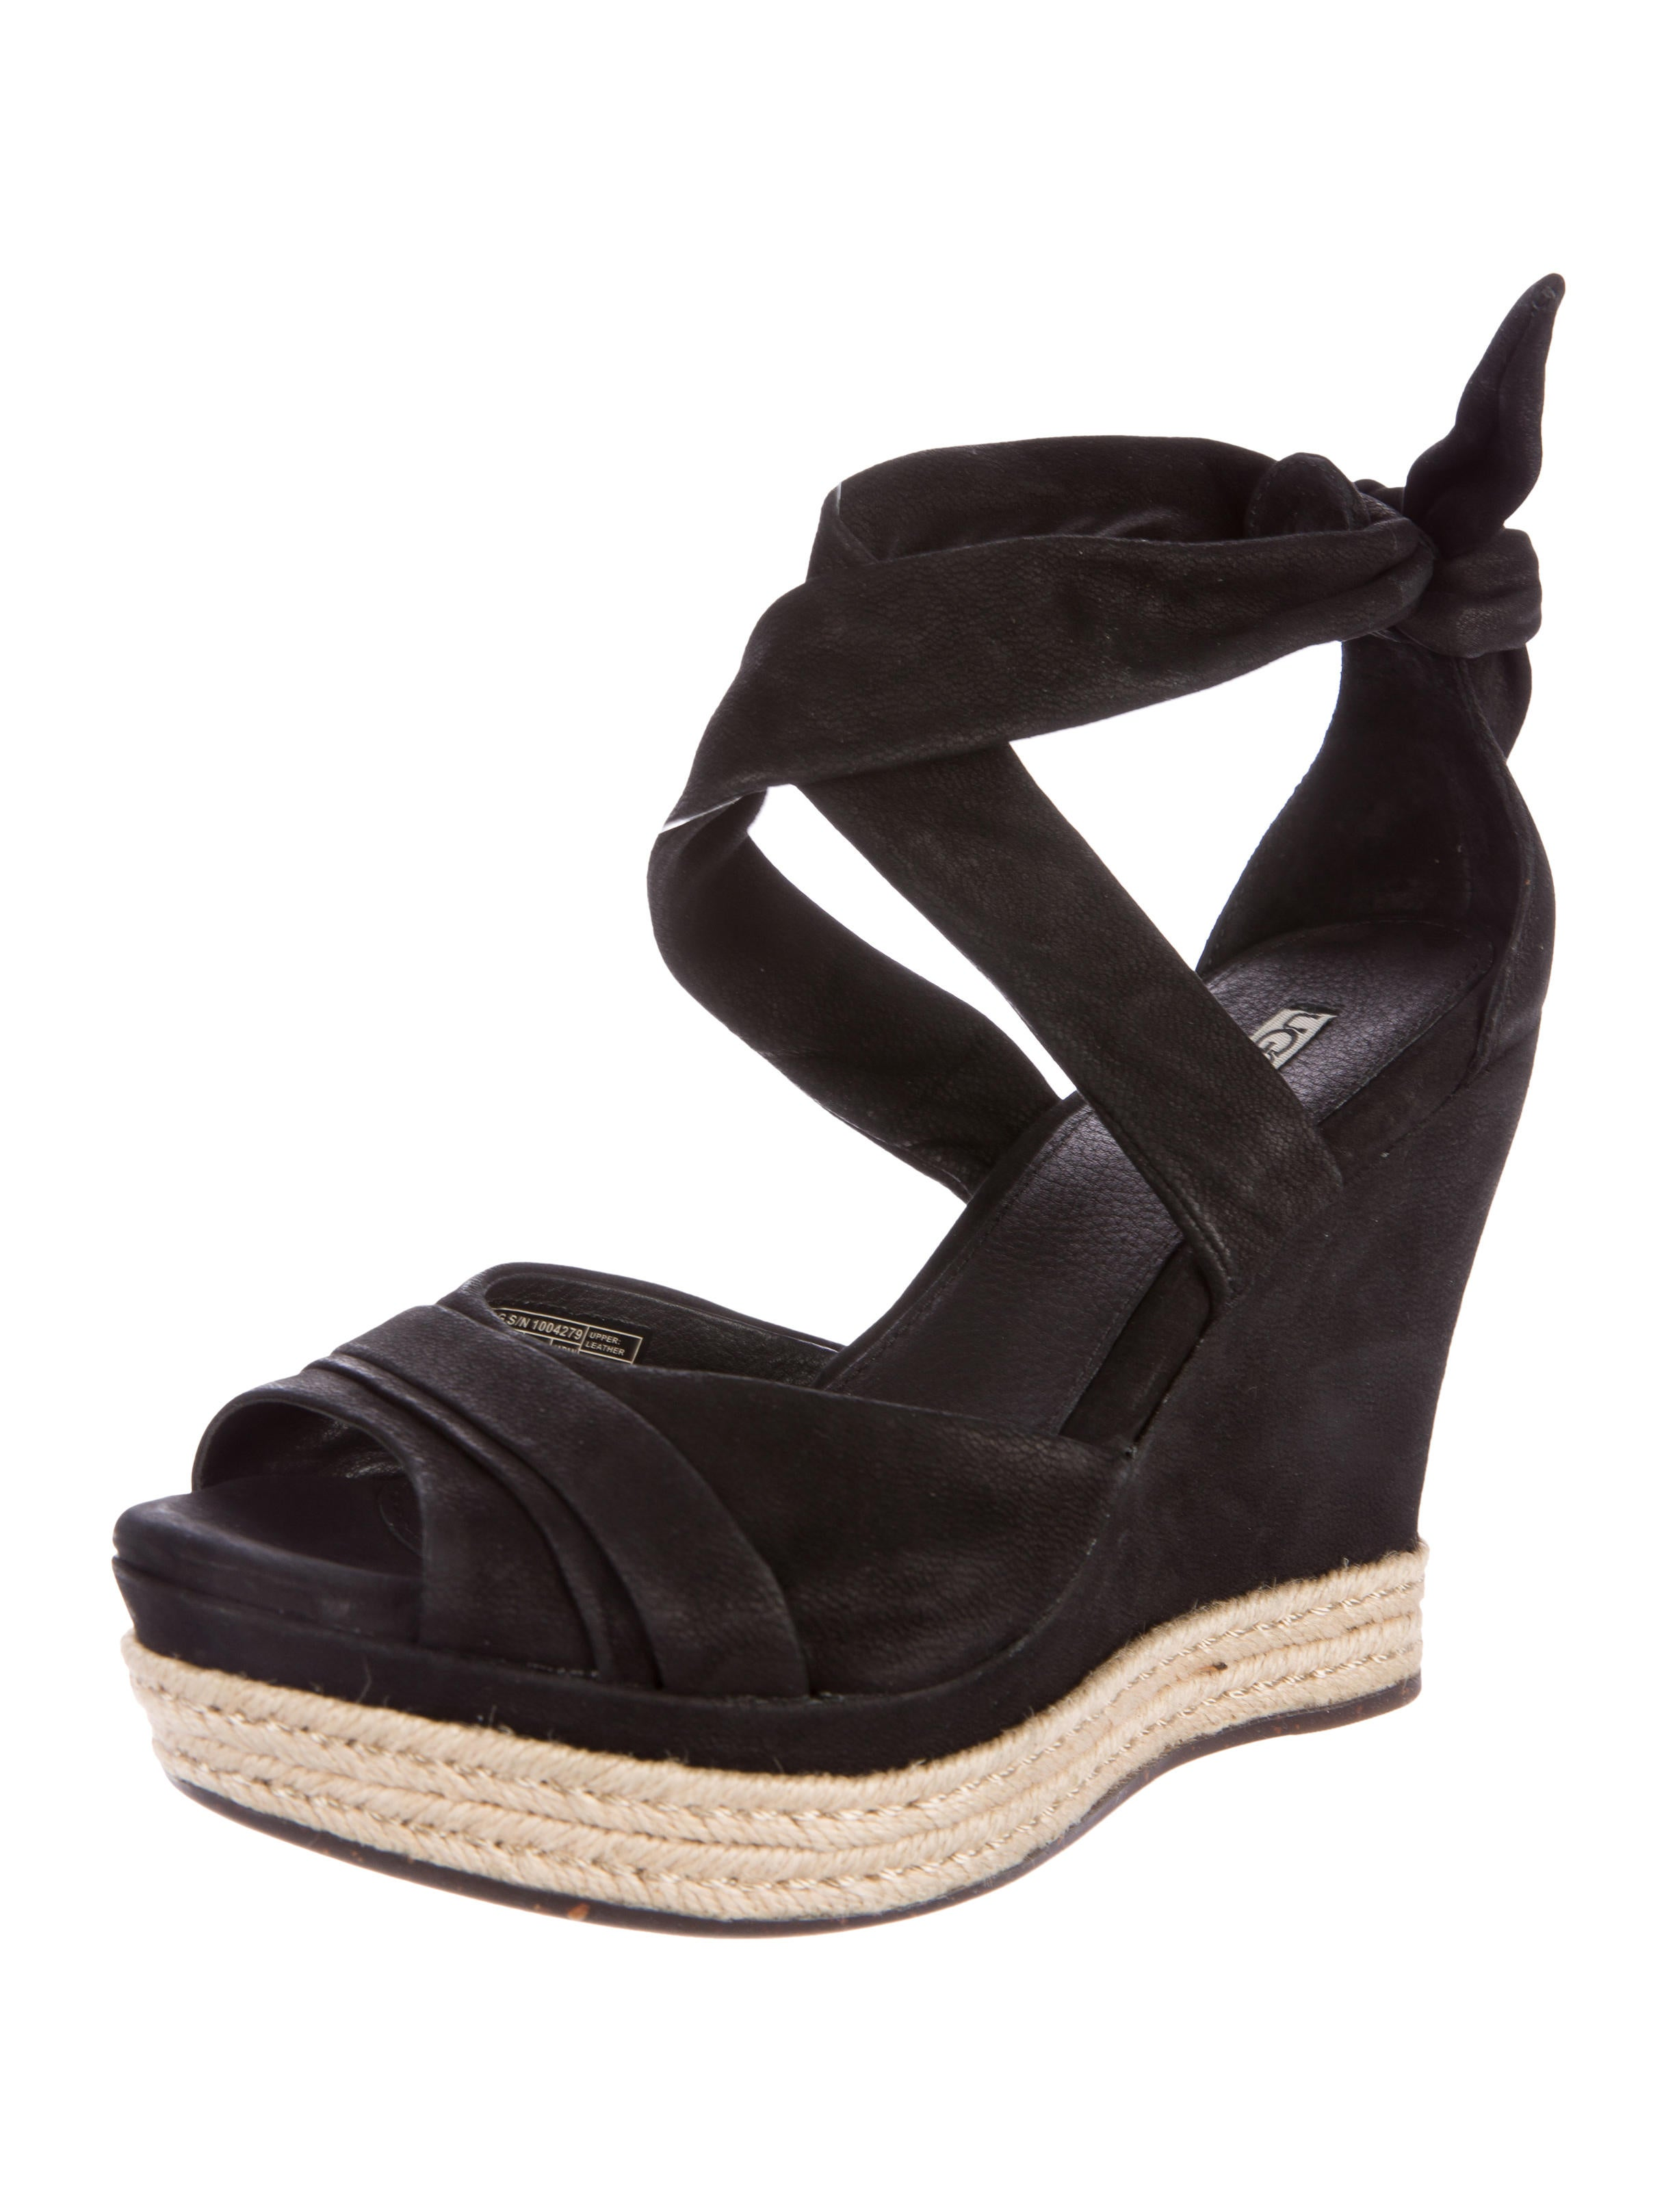 ugg australia leather espadrille wedges shoes